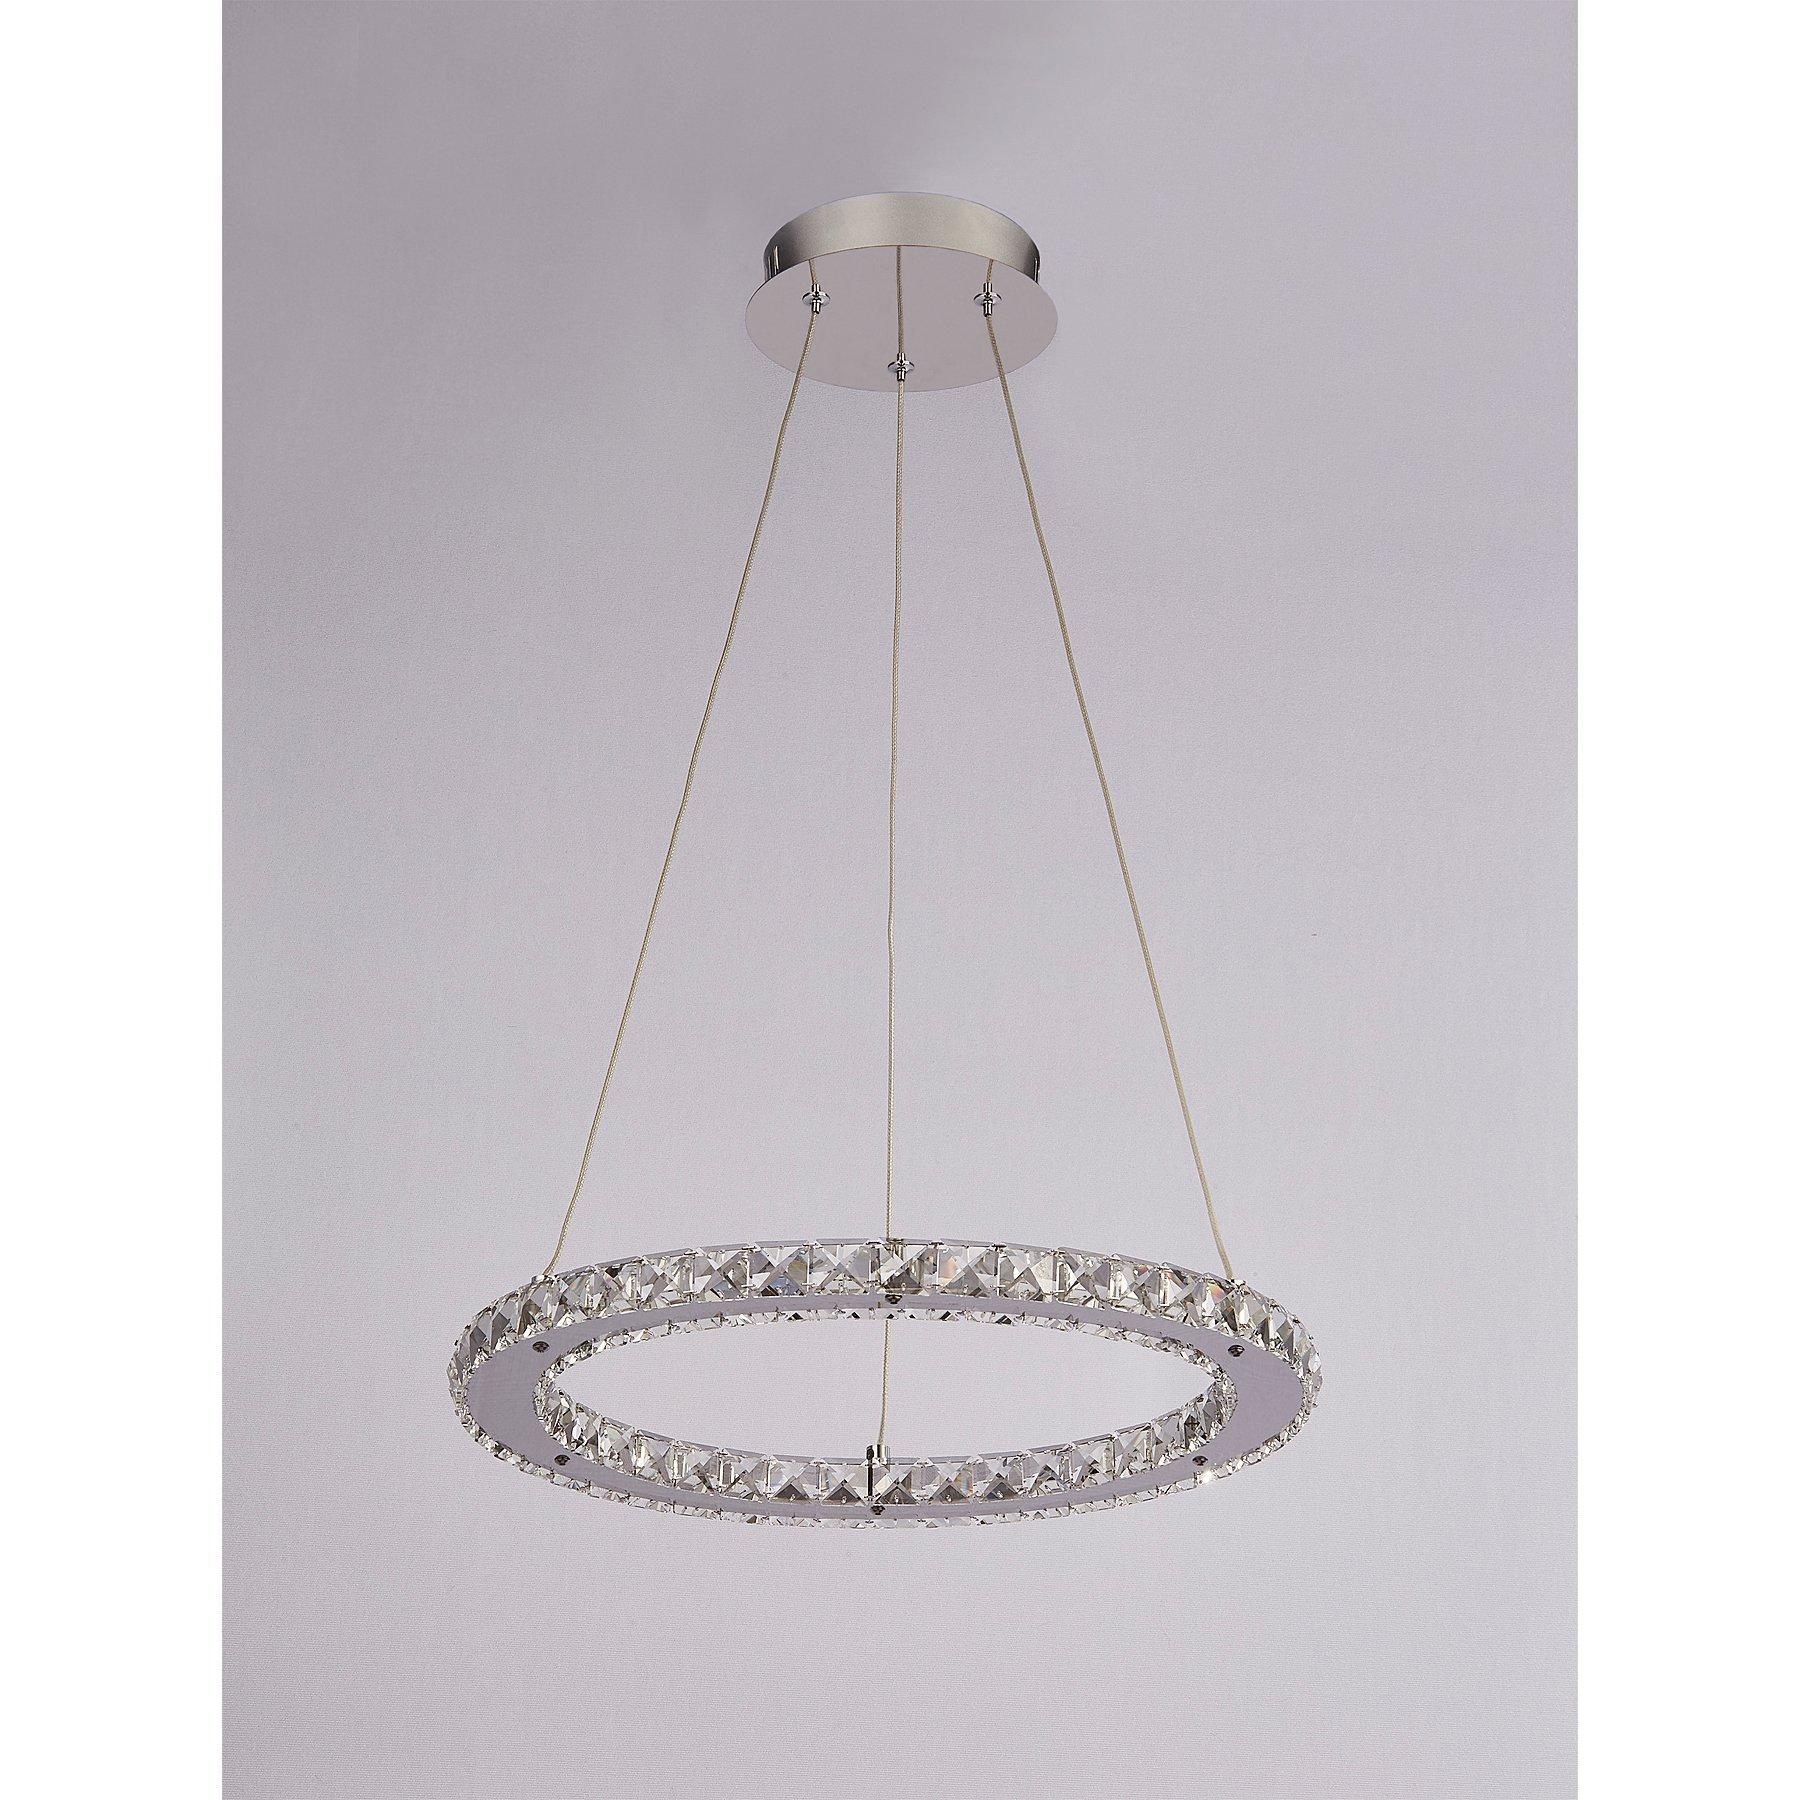 Chrome Ring Ceiling Light Home George At Asda